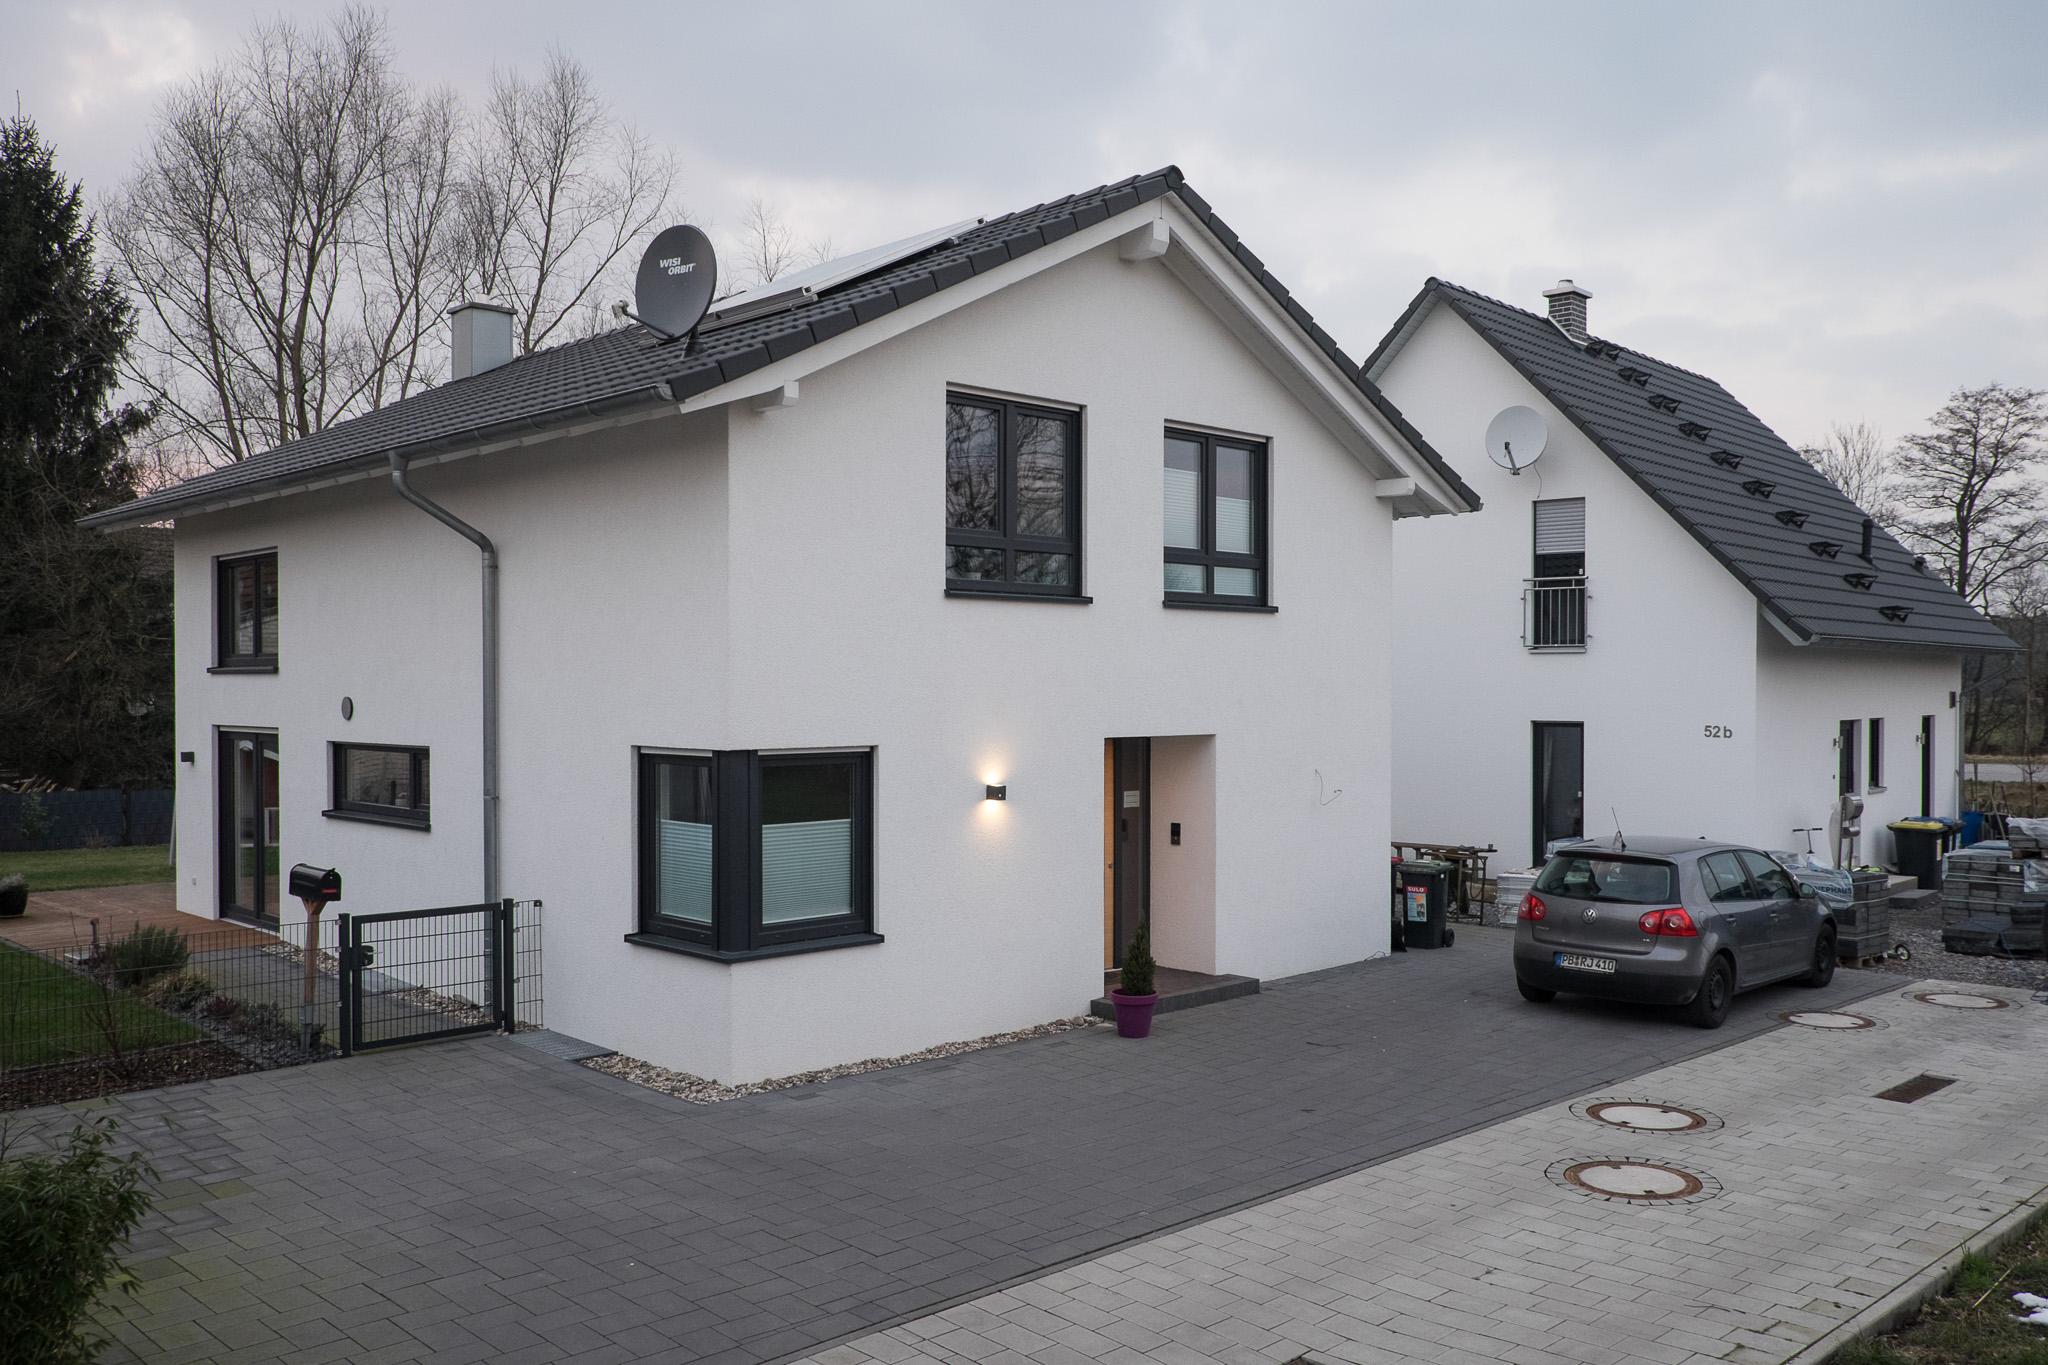 Charmant Haus Verdrahtung Bilder Ideen - Der Schaltplan - triangre.info